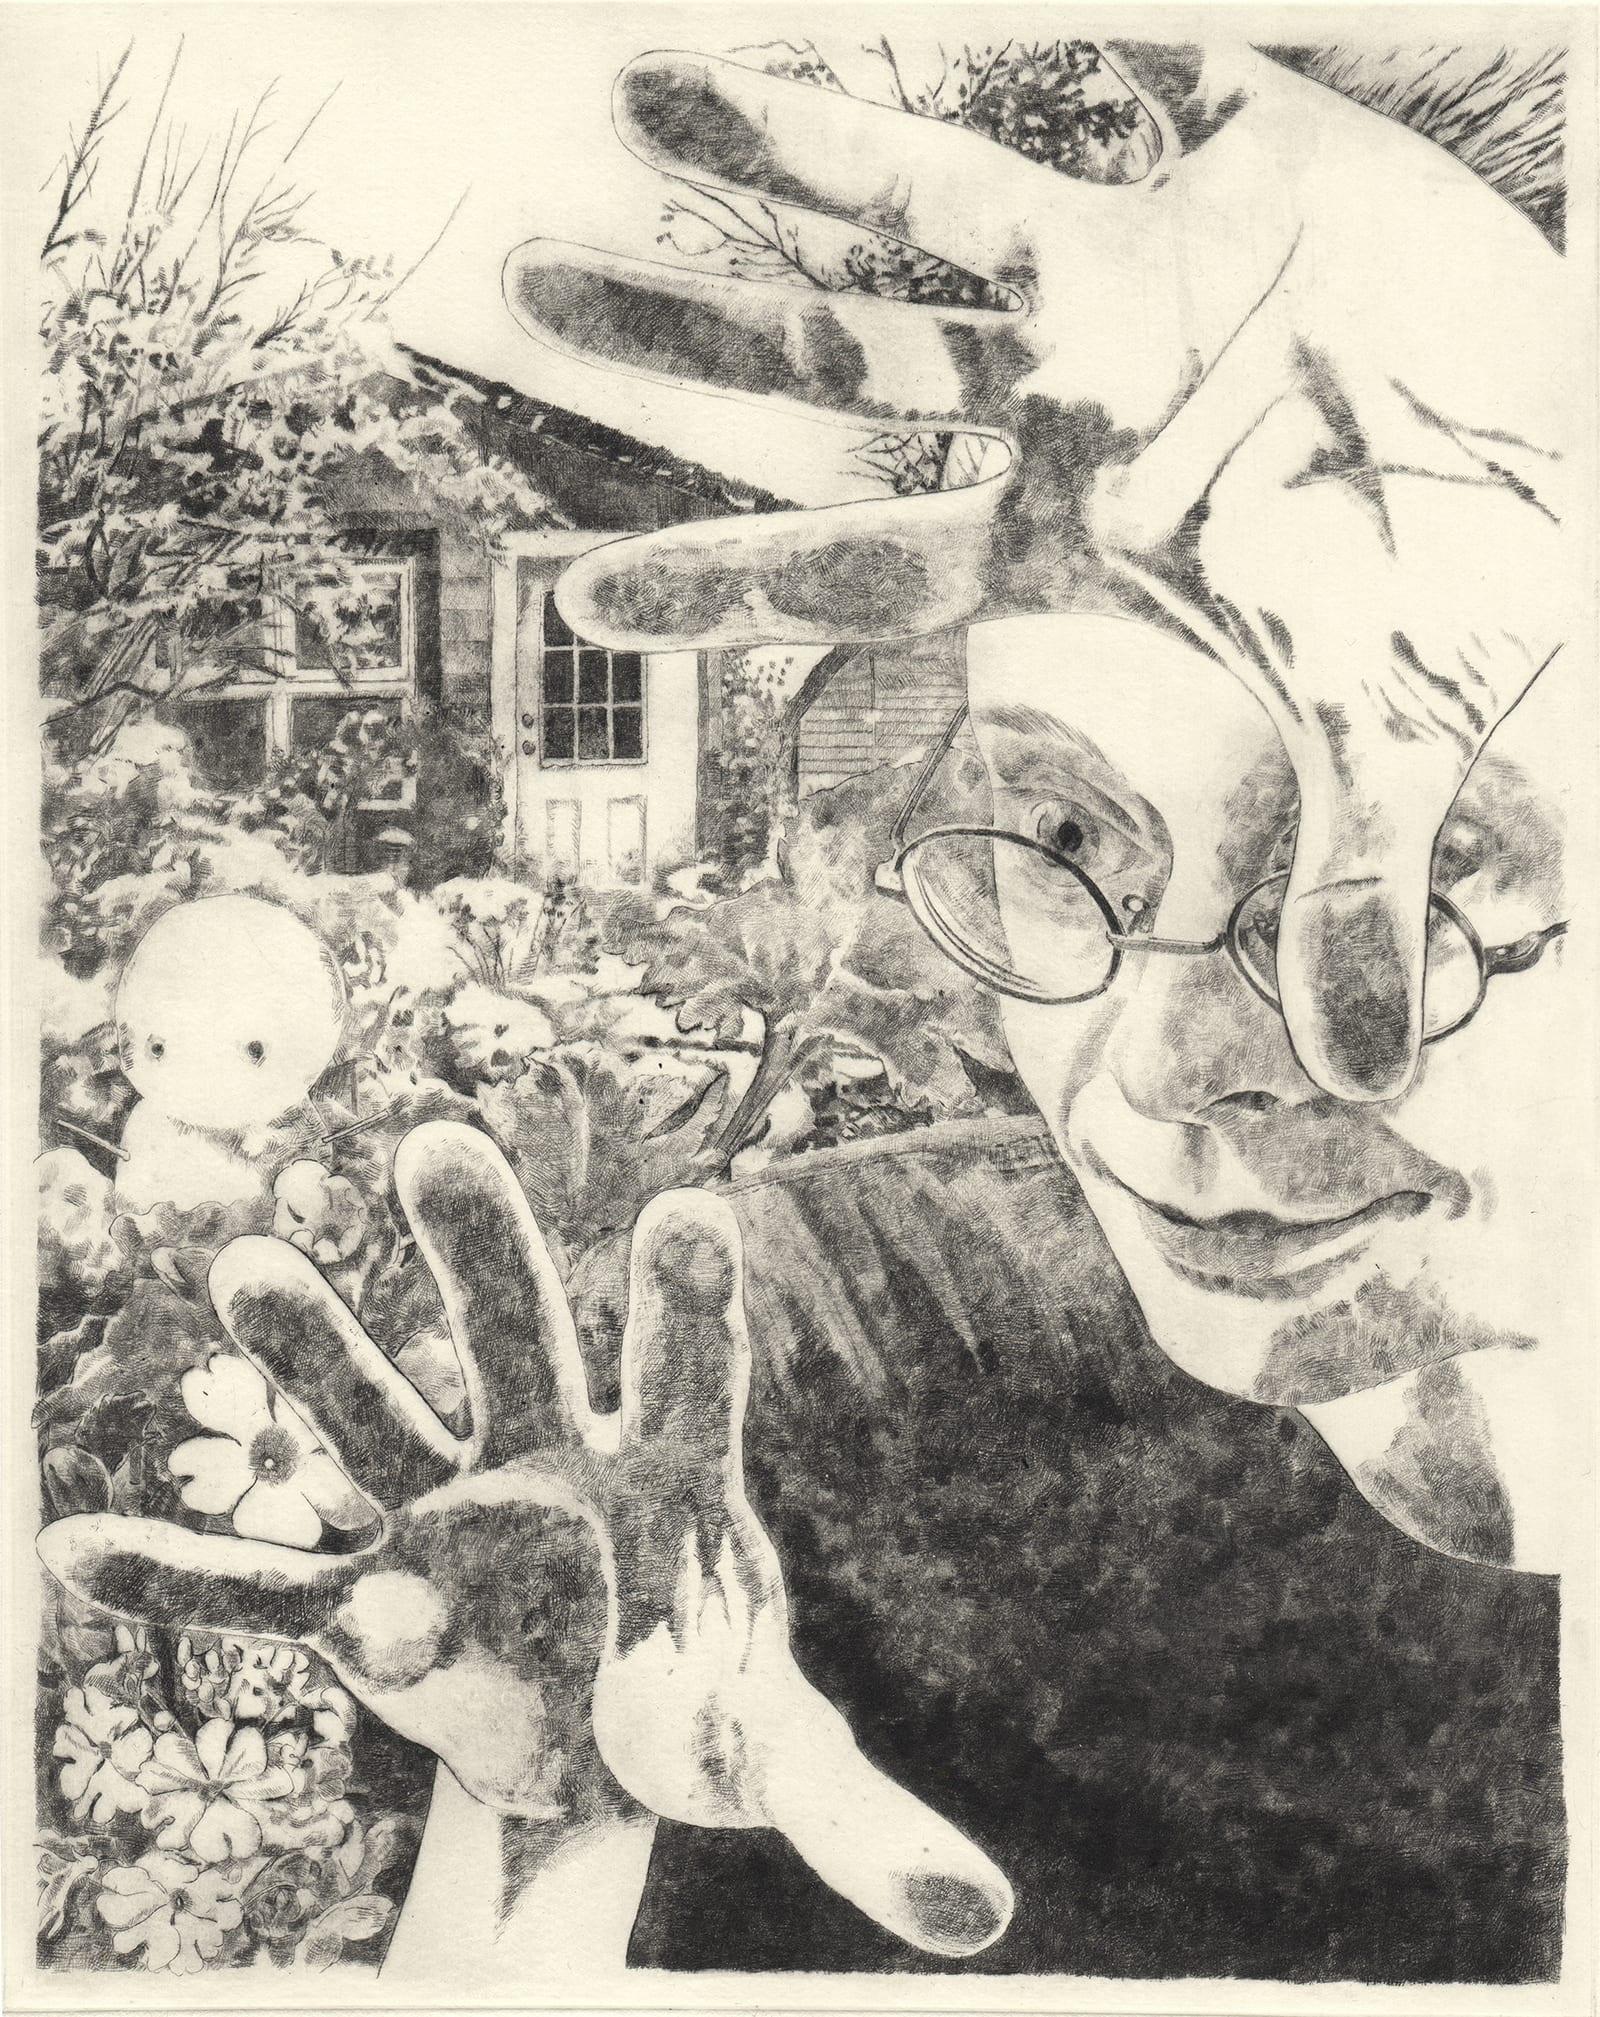 Winter 2 (drypoint etching by Yaemi Shigyo)